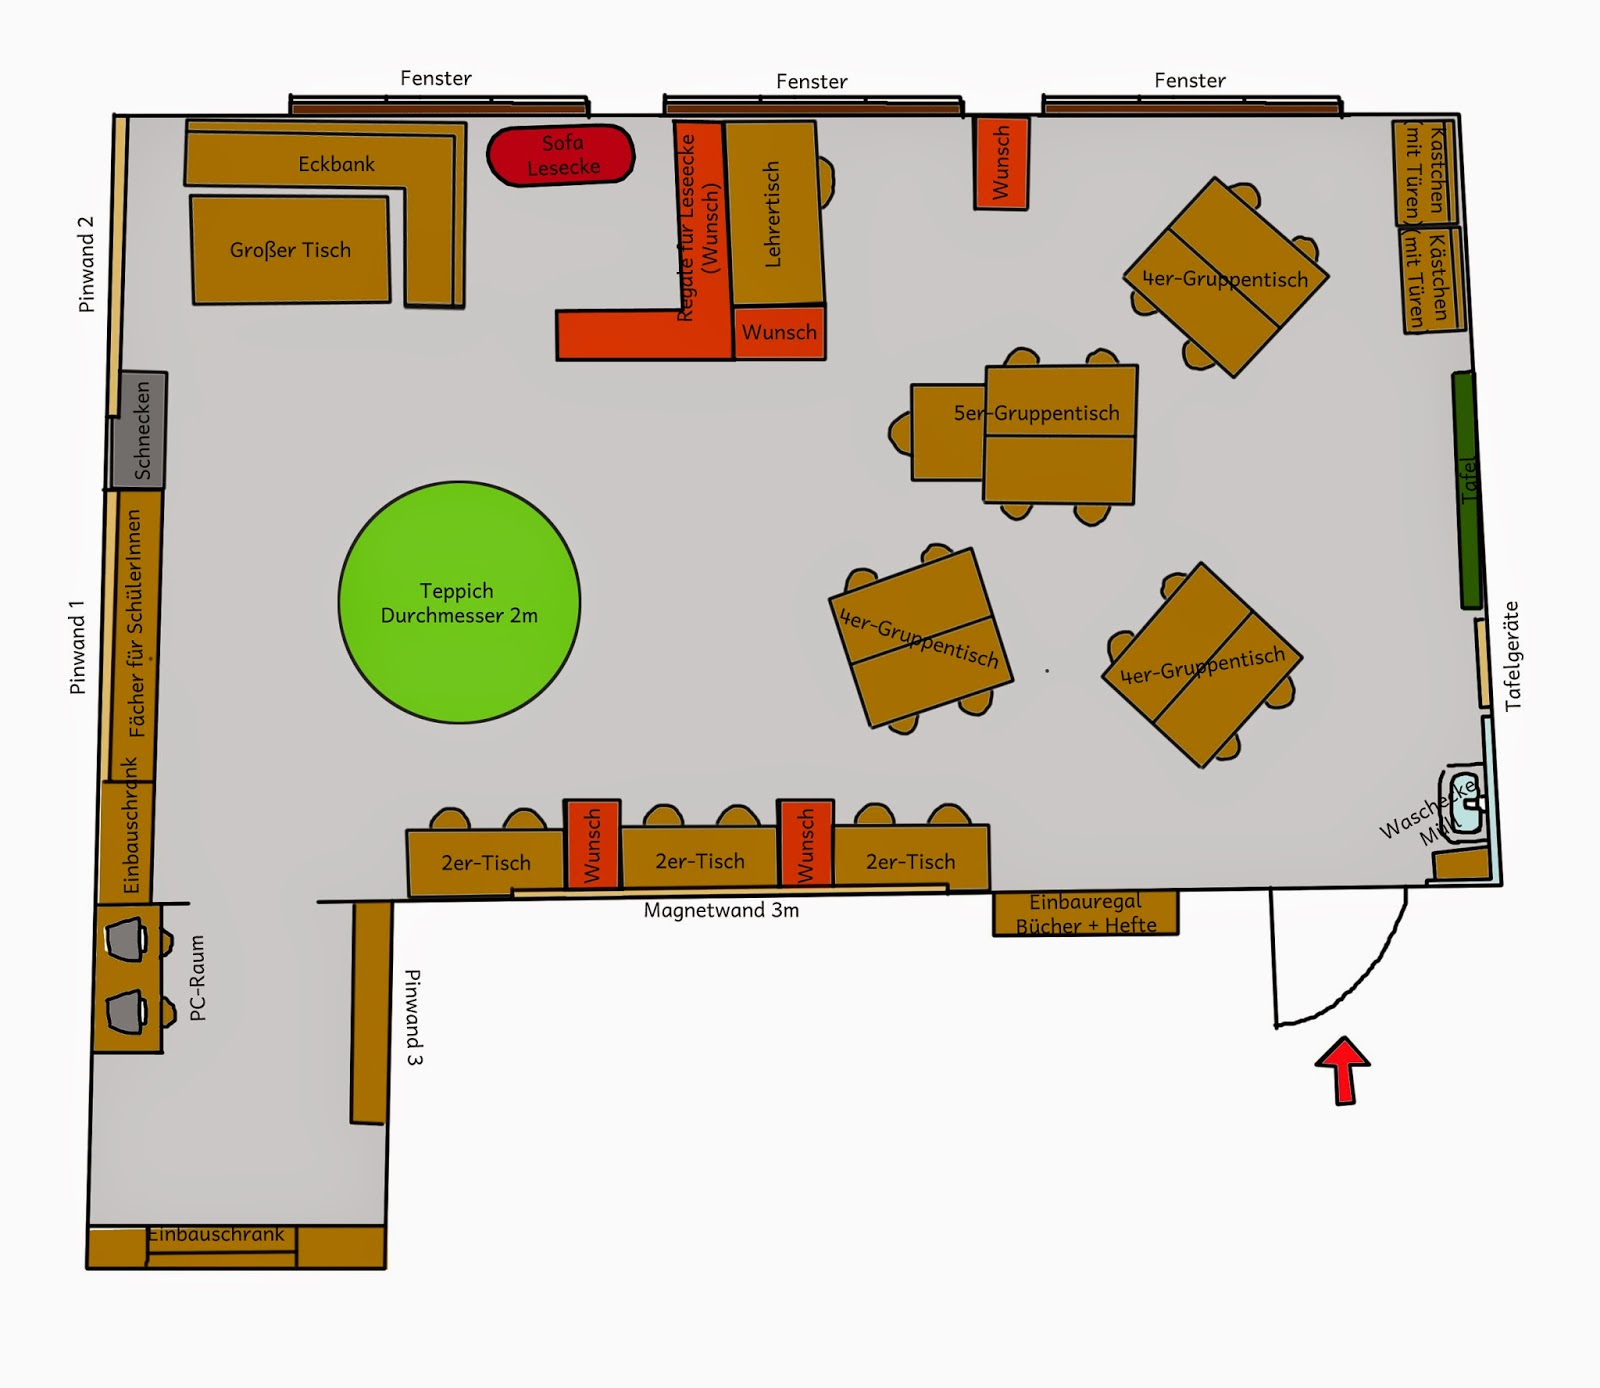 D Zimmer Einrichten With Krabbelwiese: Den Klassenraum Einrichten Also Den  Klassenraum Einrichten. From Kerstinskrabbelwiese